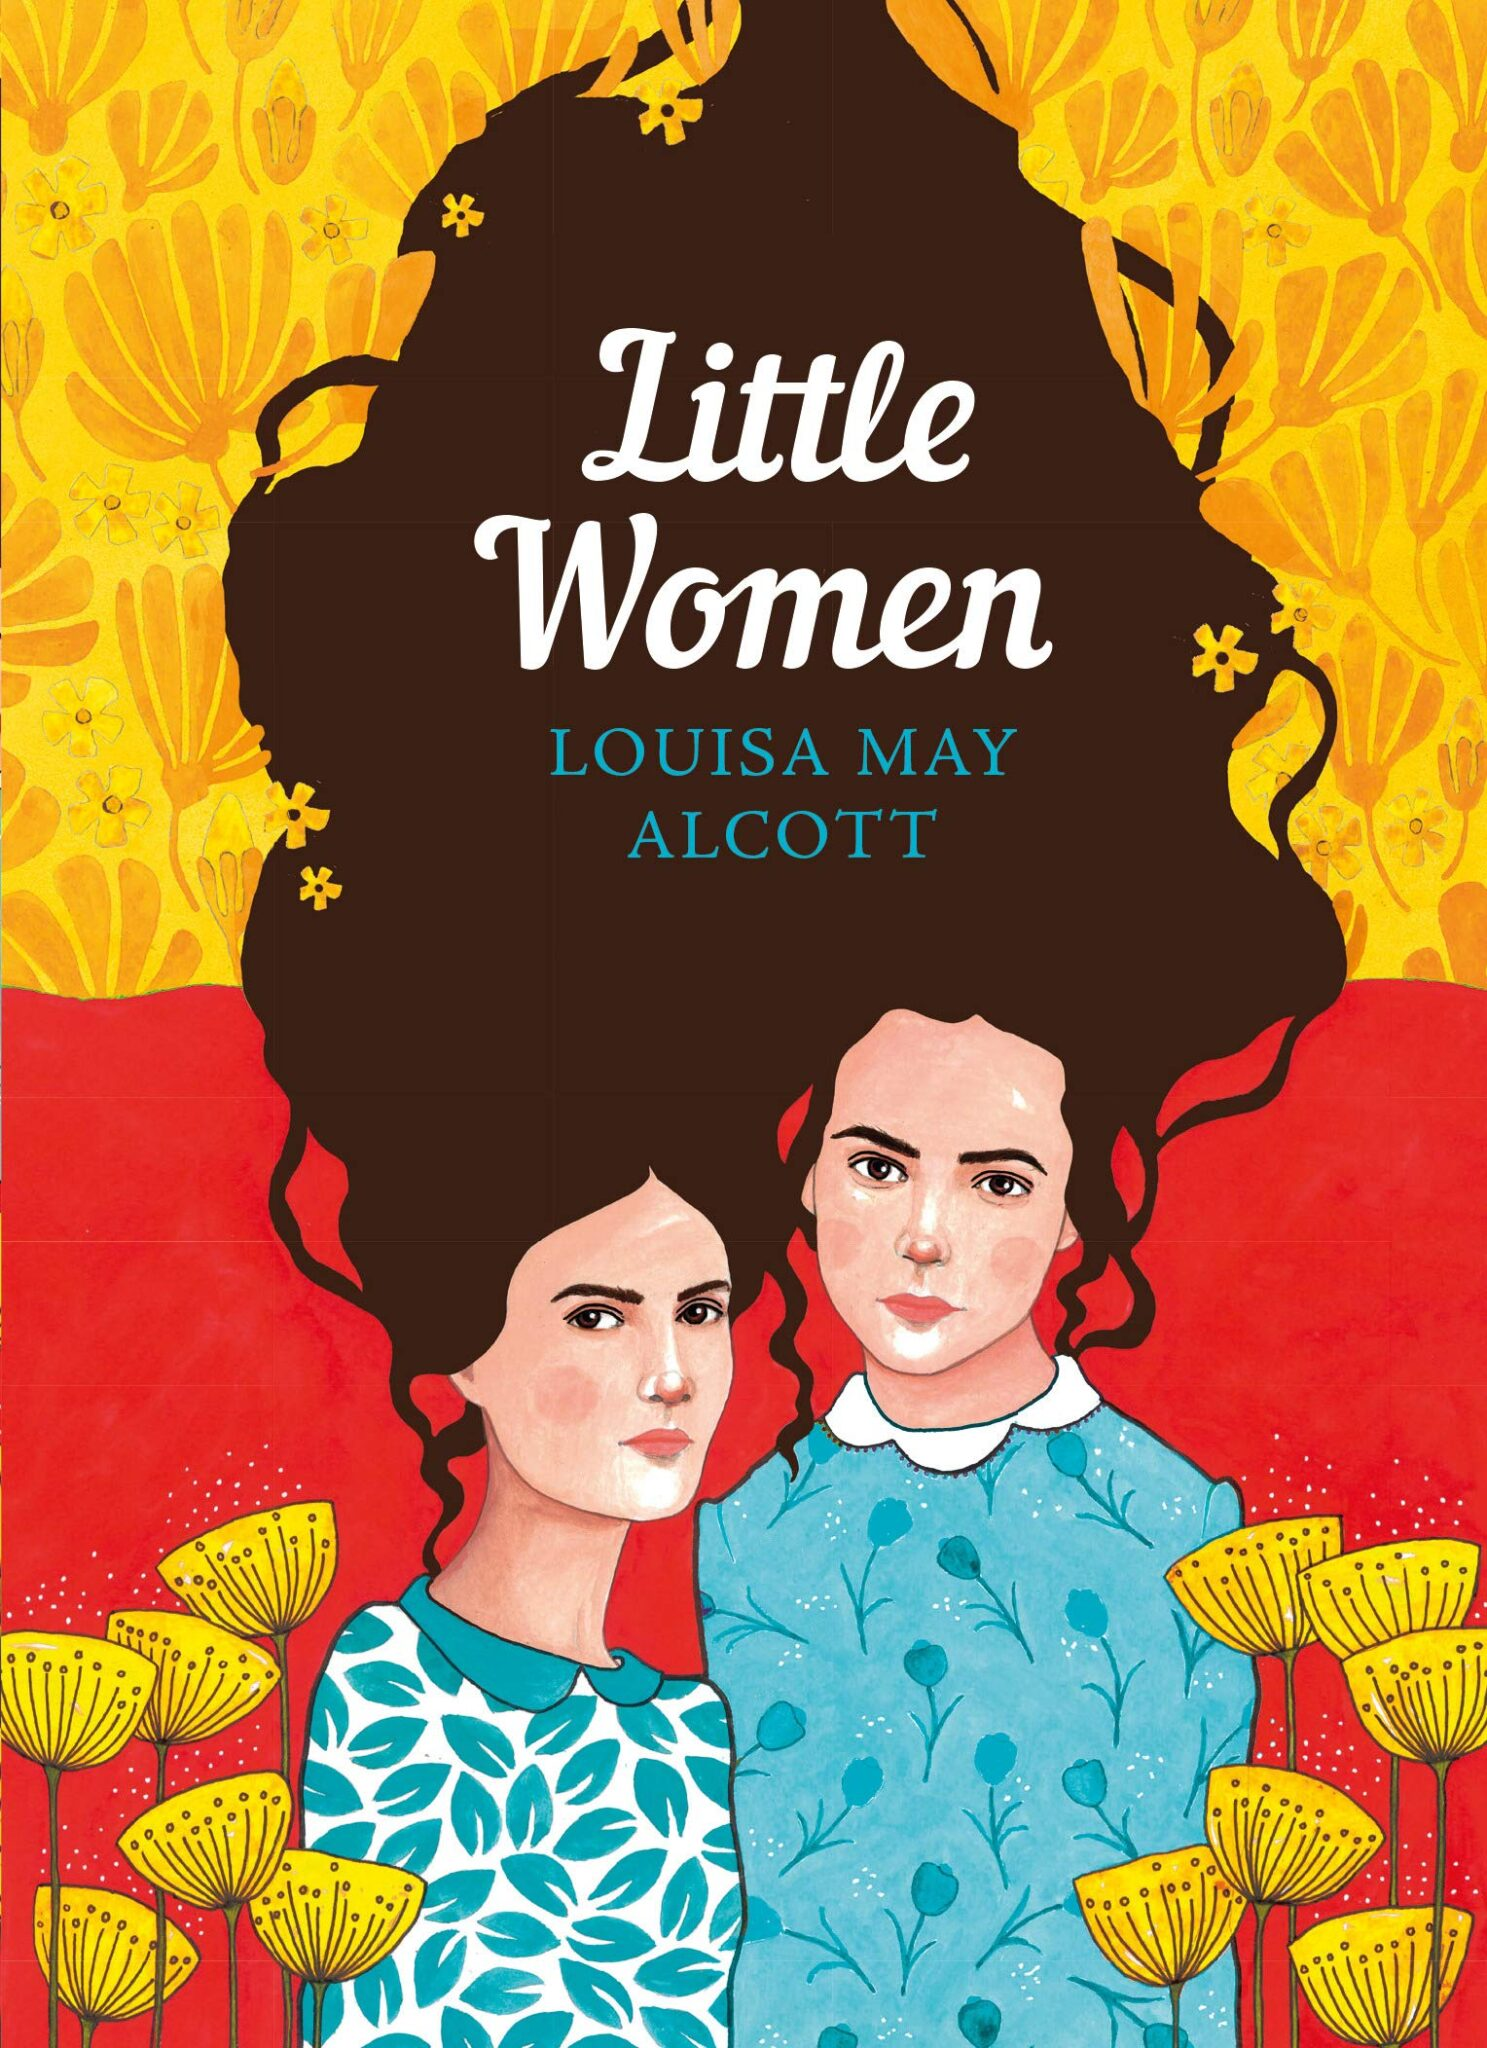 little women louisa may alcott sisterhood collection